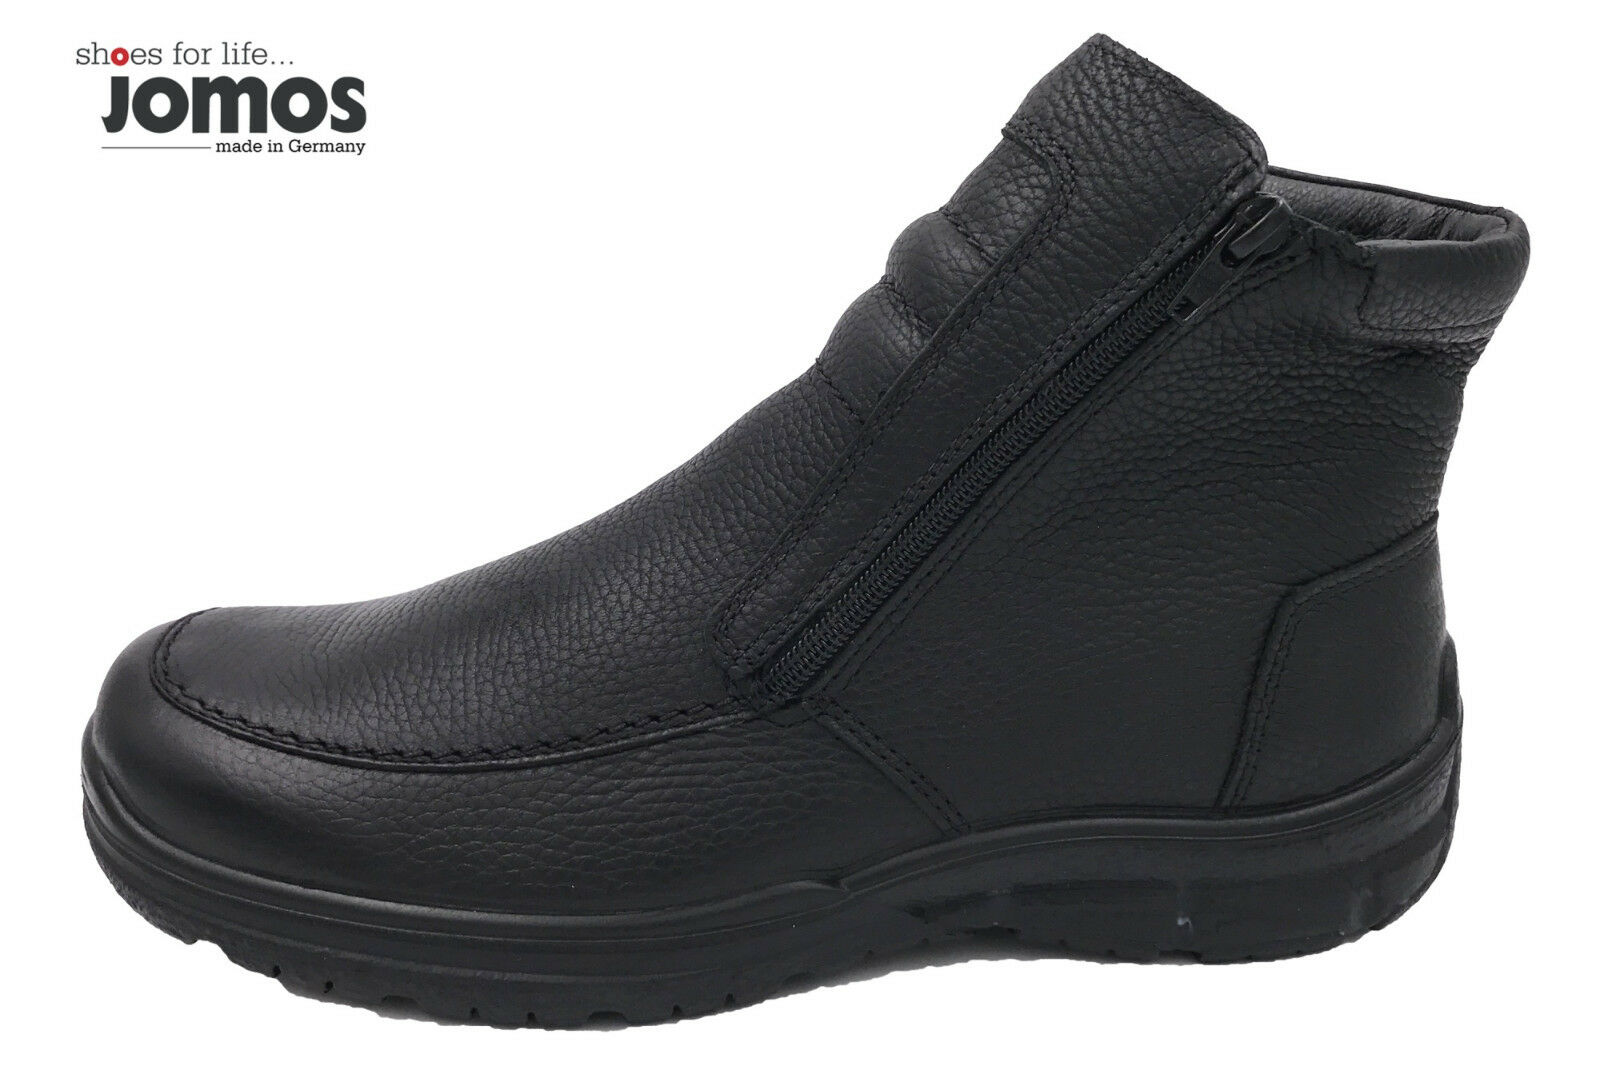 Jomos Herren Winter Stiefel Schwarz Leder Boots Lammwollfutter NEU 416501-33-000